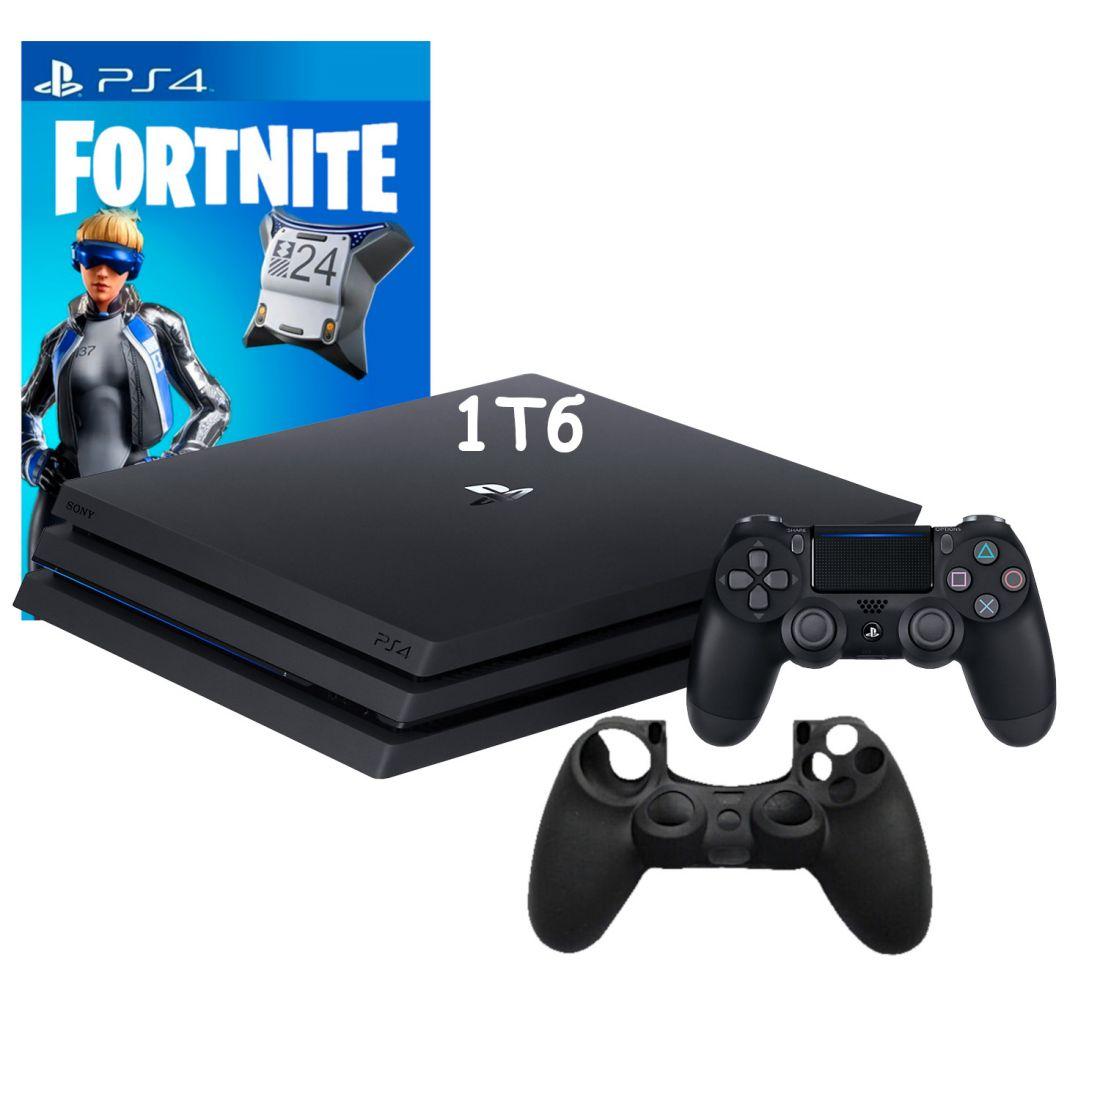 Sony PlayStation 4 Pro 1Tb ( CUH-7208B ) + Игра Fortnite Neo Versa + Силиконовый чехол для джойстика